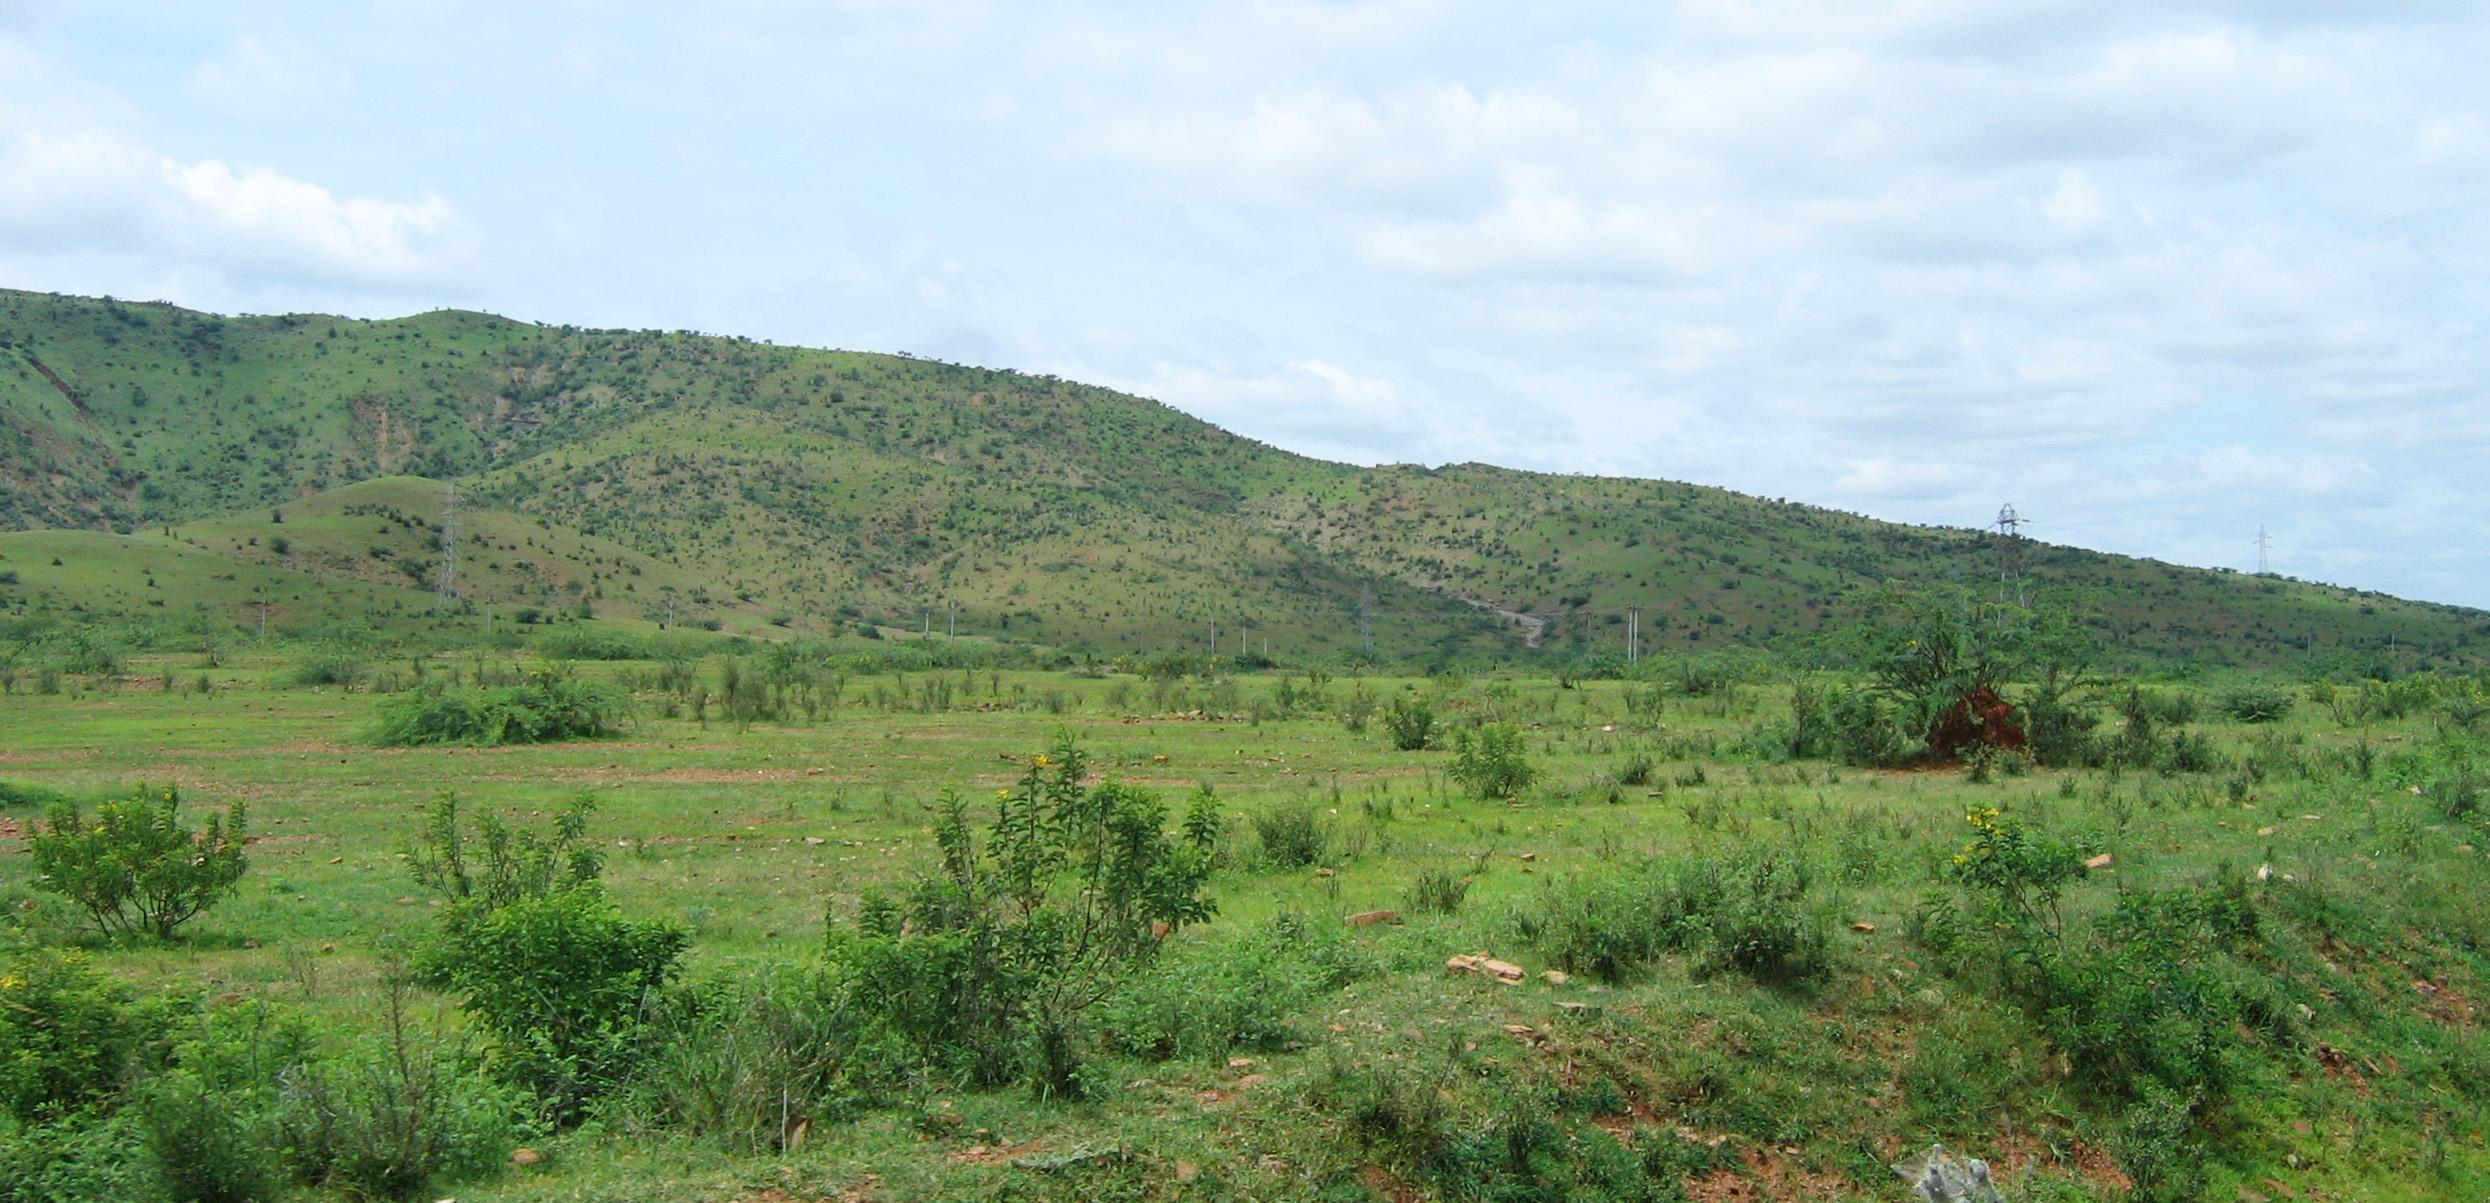 File:Andhra Pradesh - Landscapes from Andhra Pradesh ...